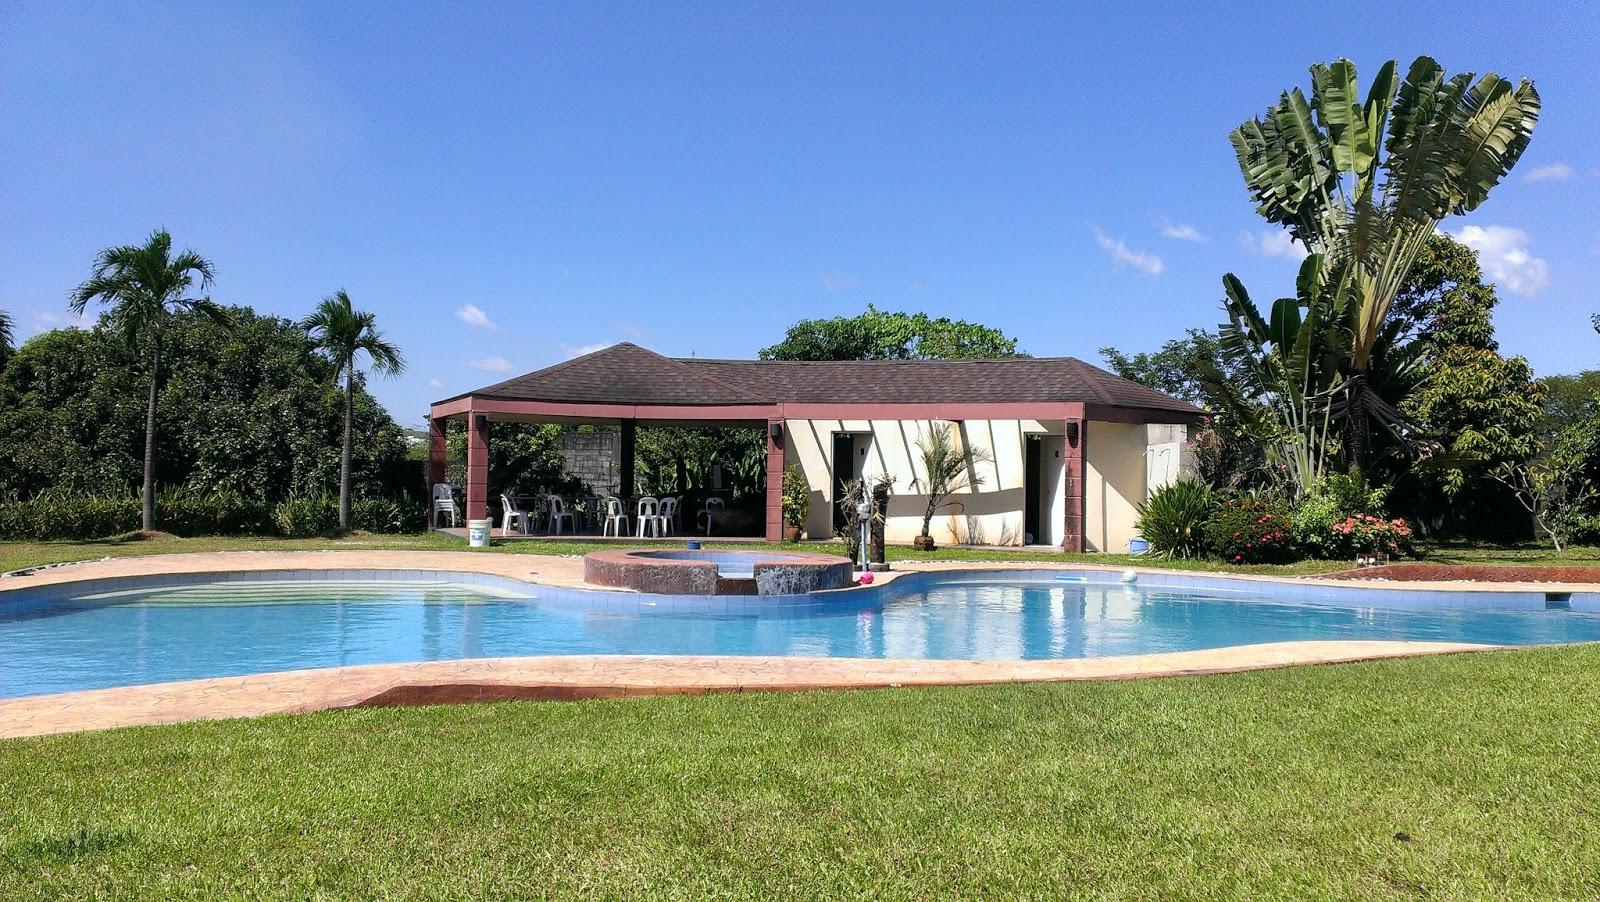 La Bella Villa Resort in Valenzuela, Metro Manila